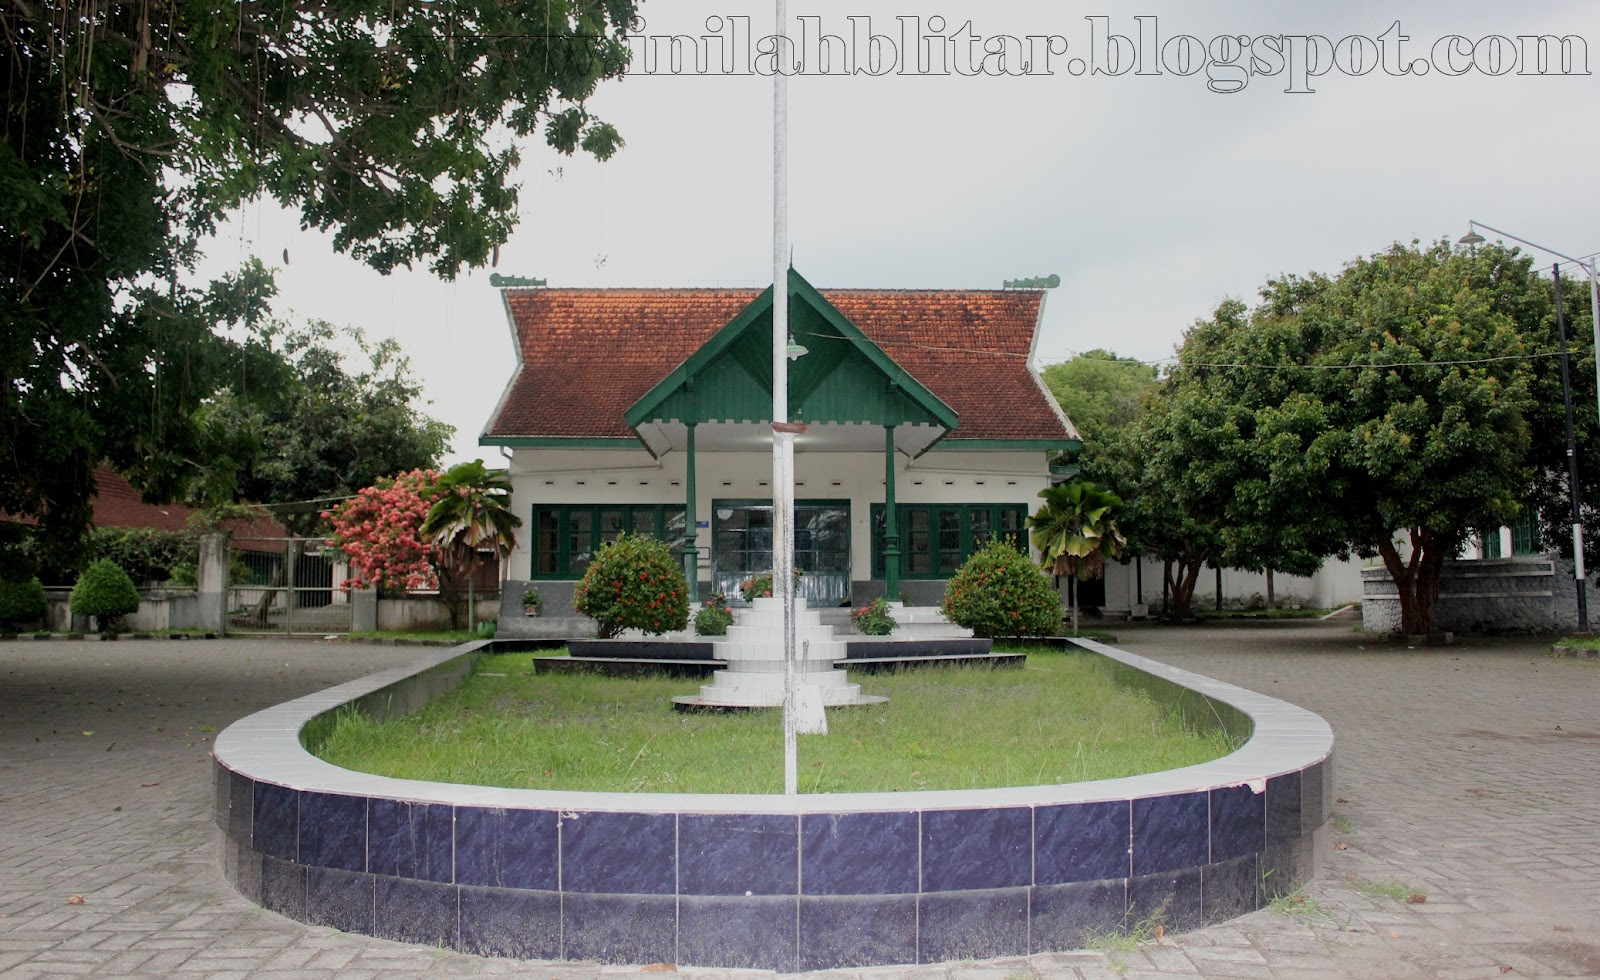 Budaya Makanan Ciri Khas Kabupaten Blitar Ayumegayanti21 Istana Gebang Lebih